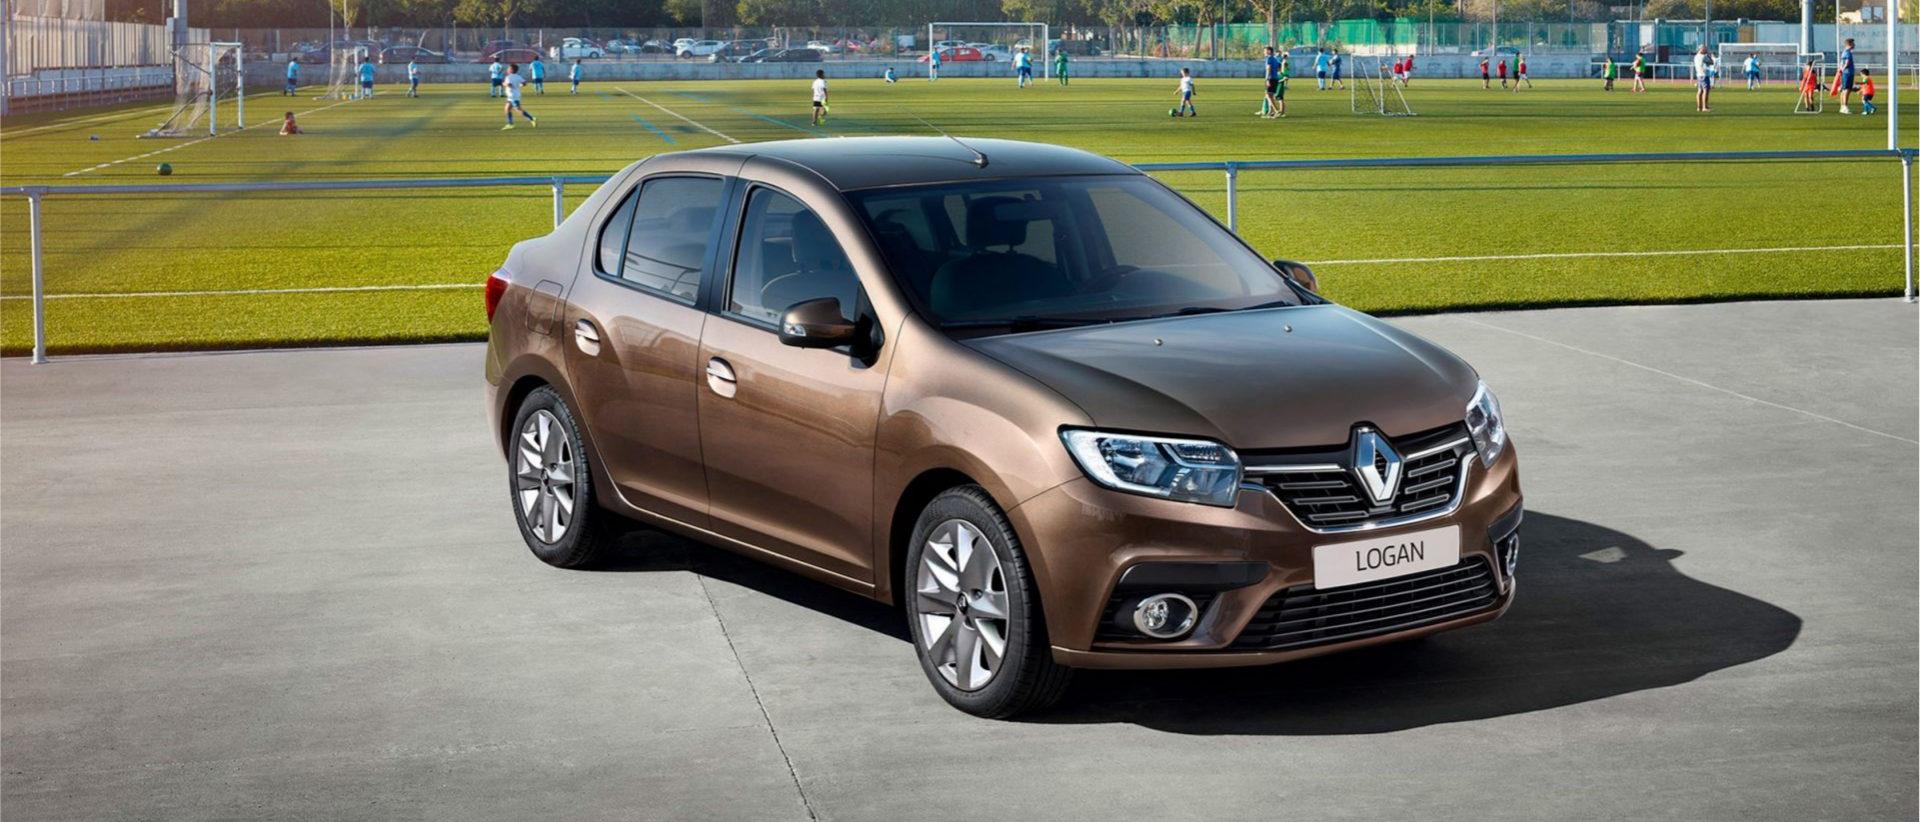 Renault LOGAN фото 3